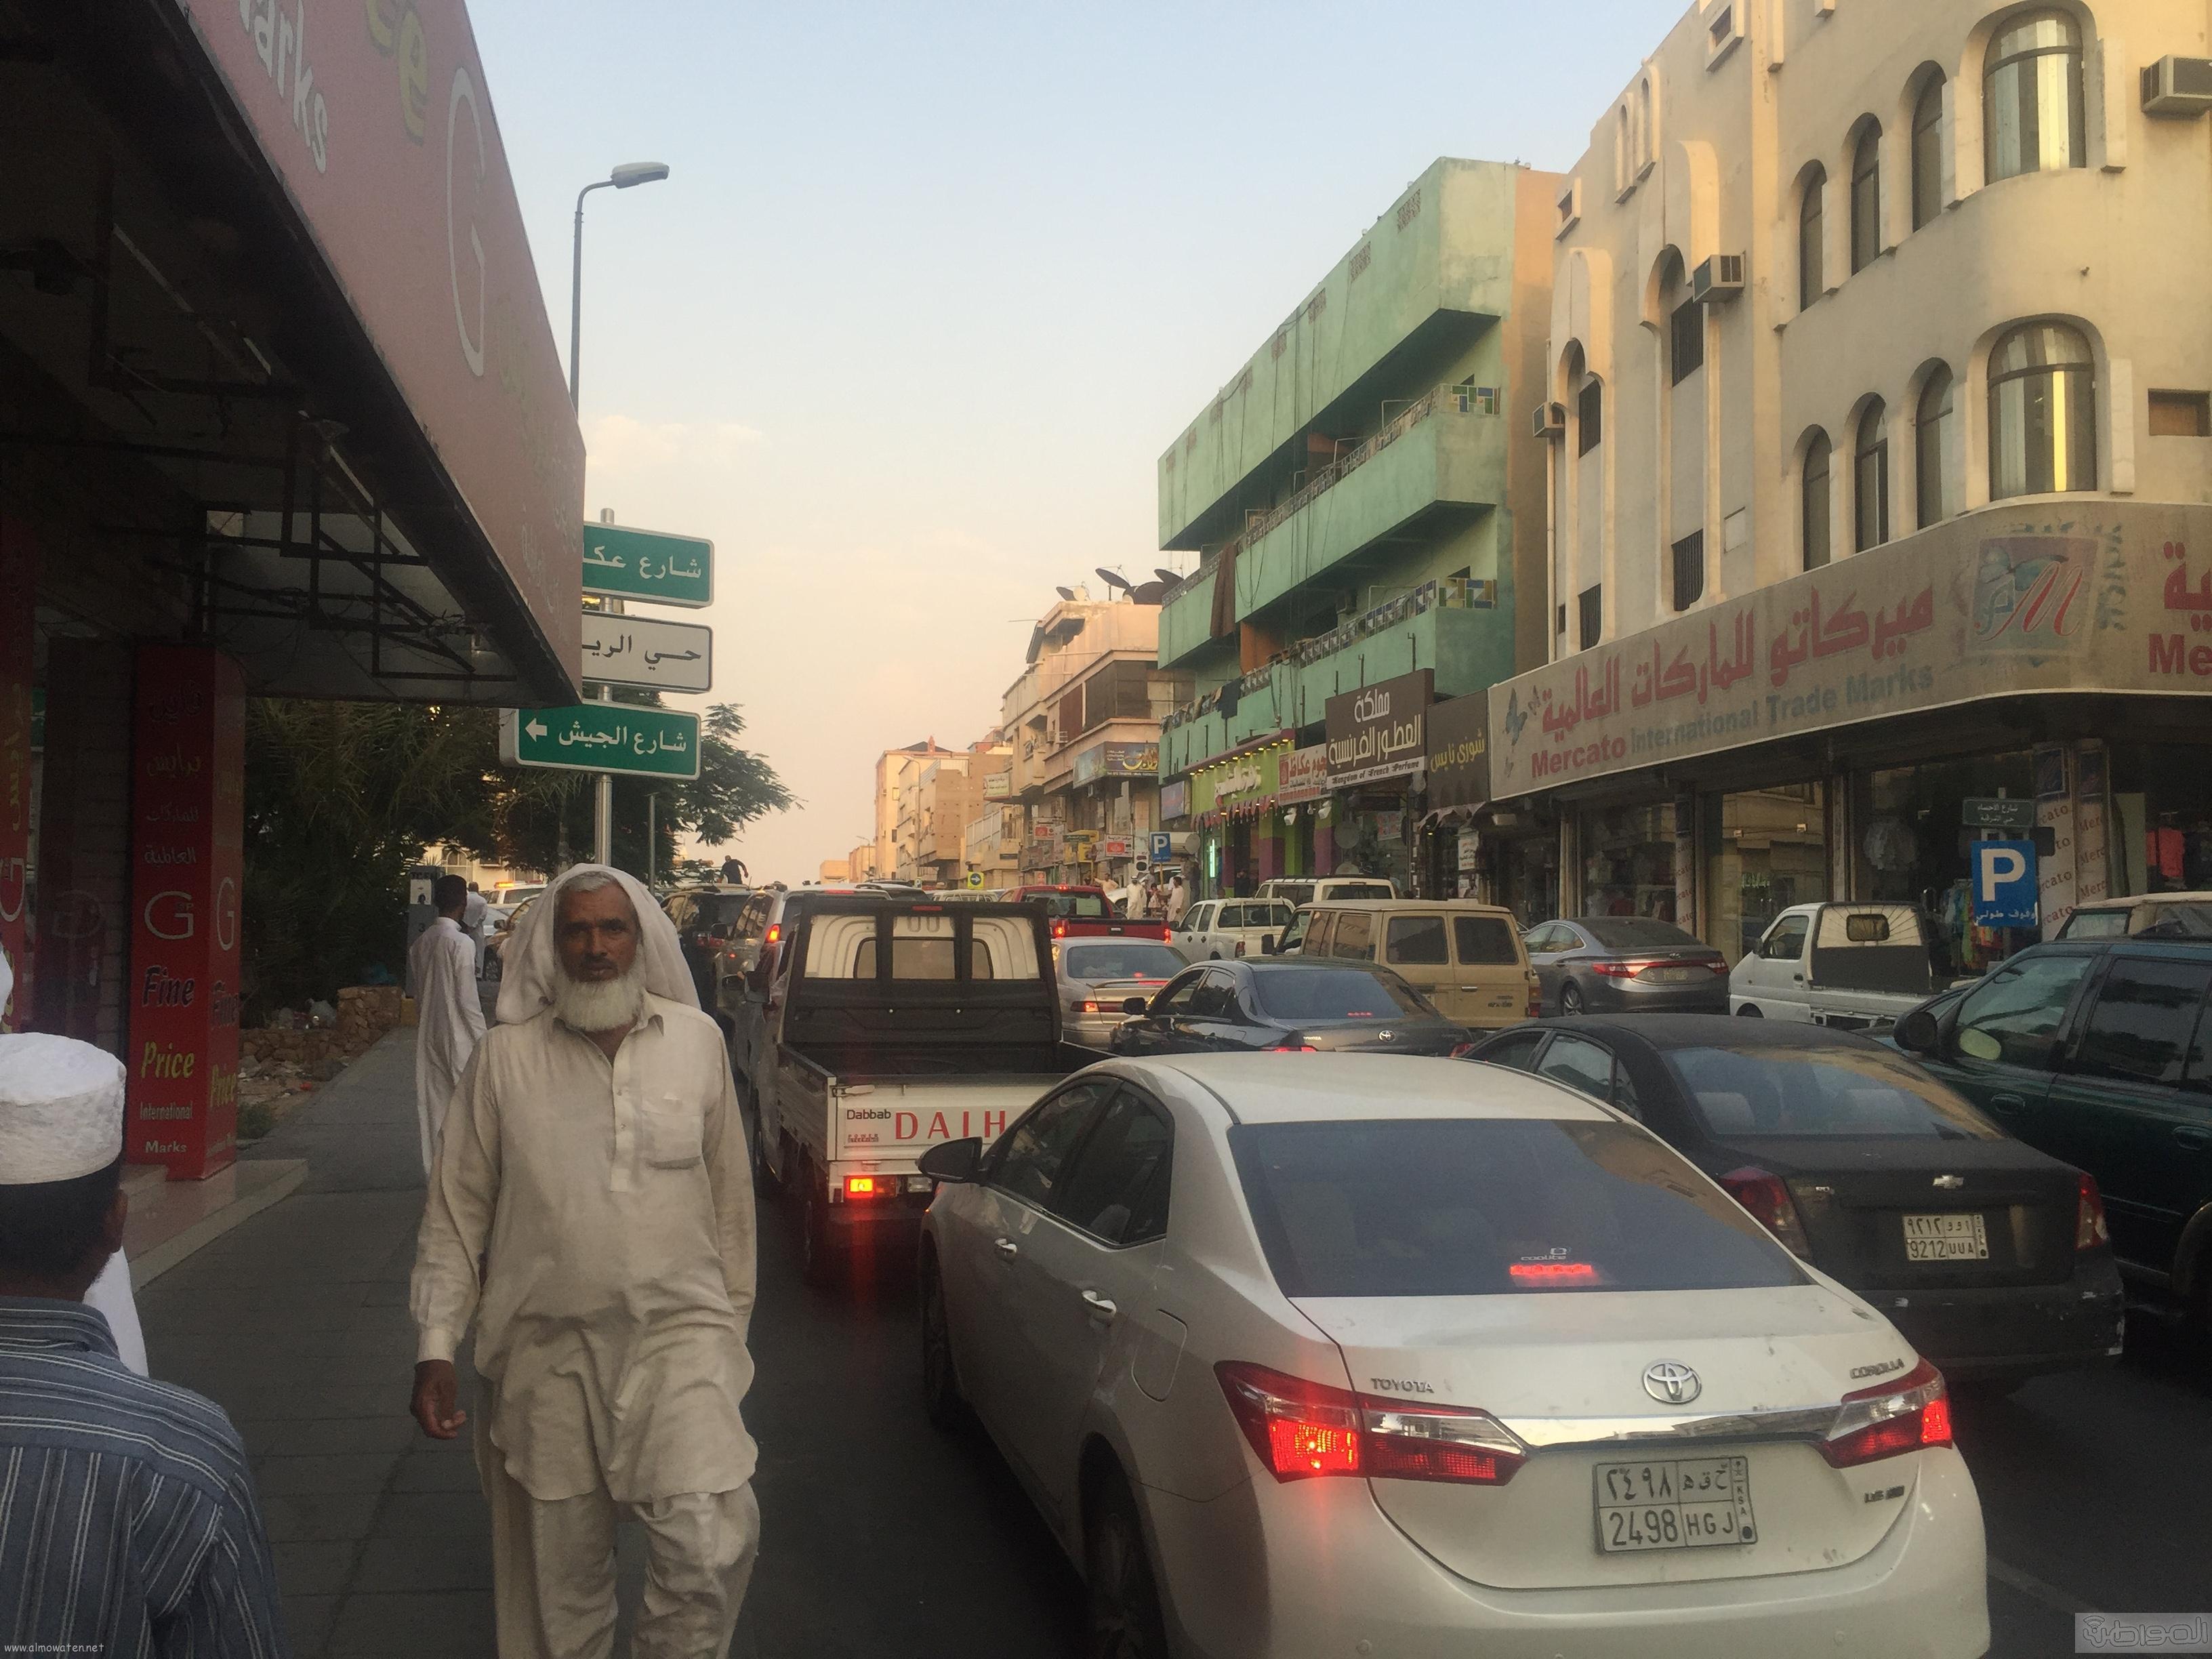 شارع عكاظ بالطائف زوار رمضان (2)